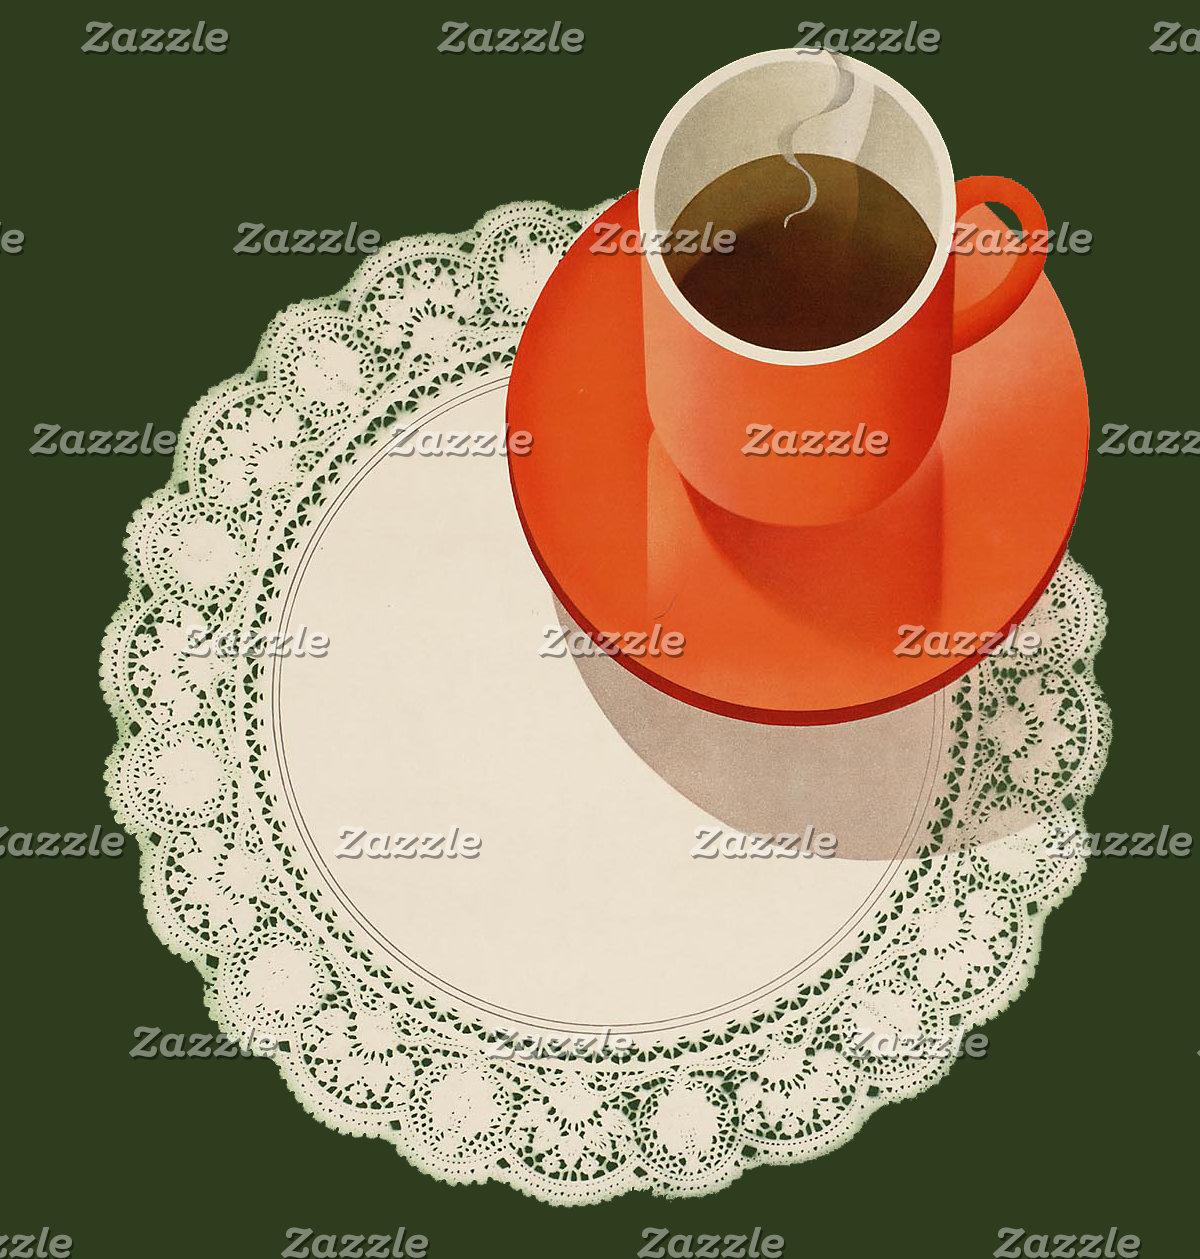 Tea and doily